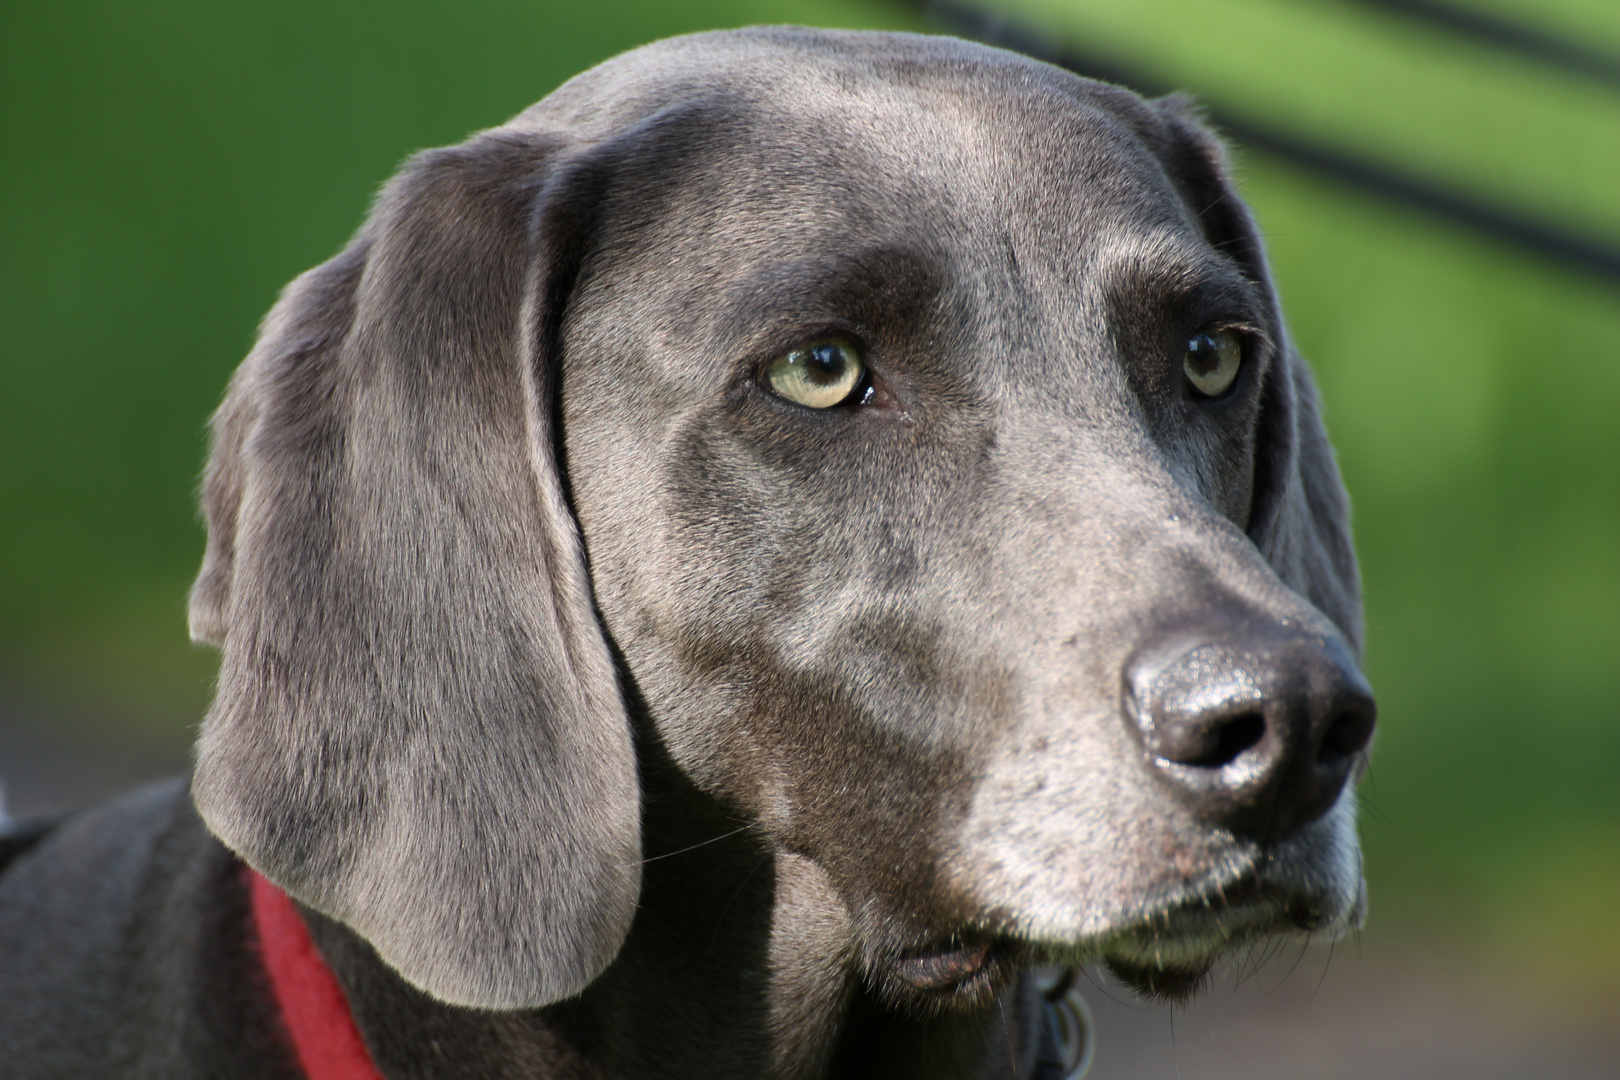 Labrador?